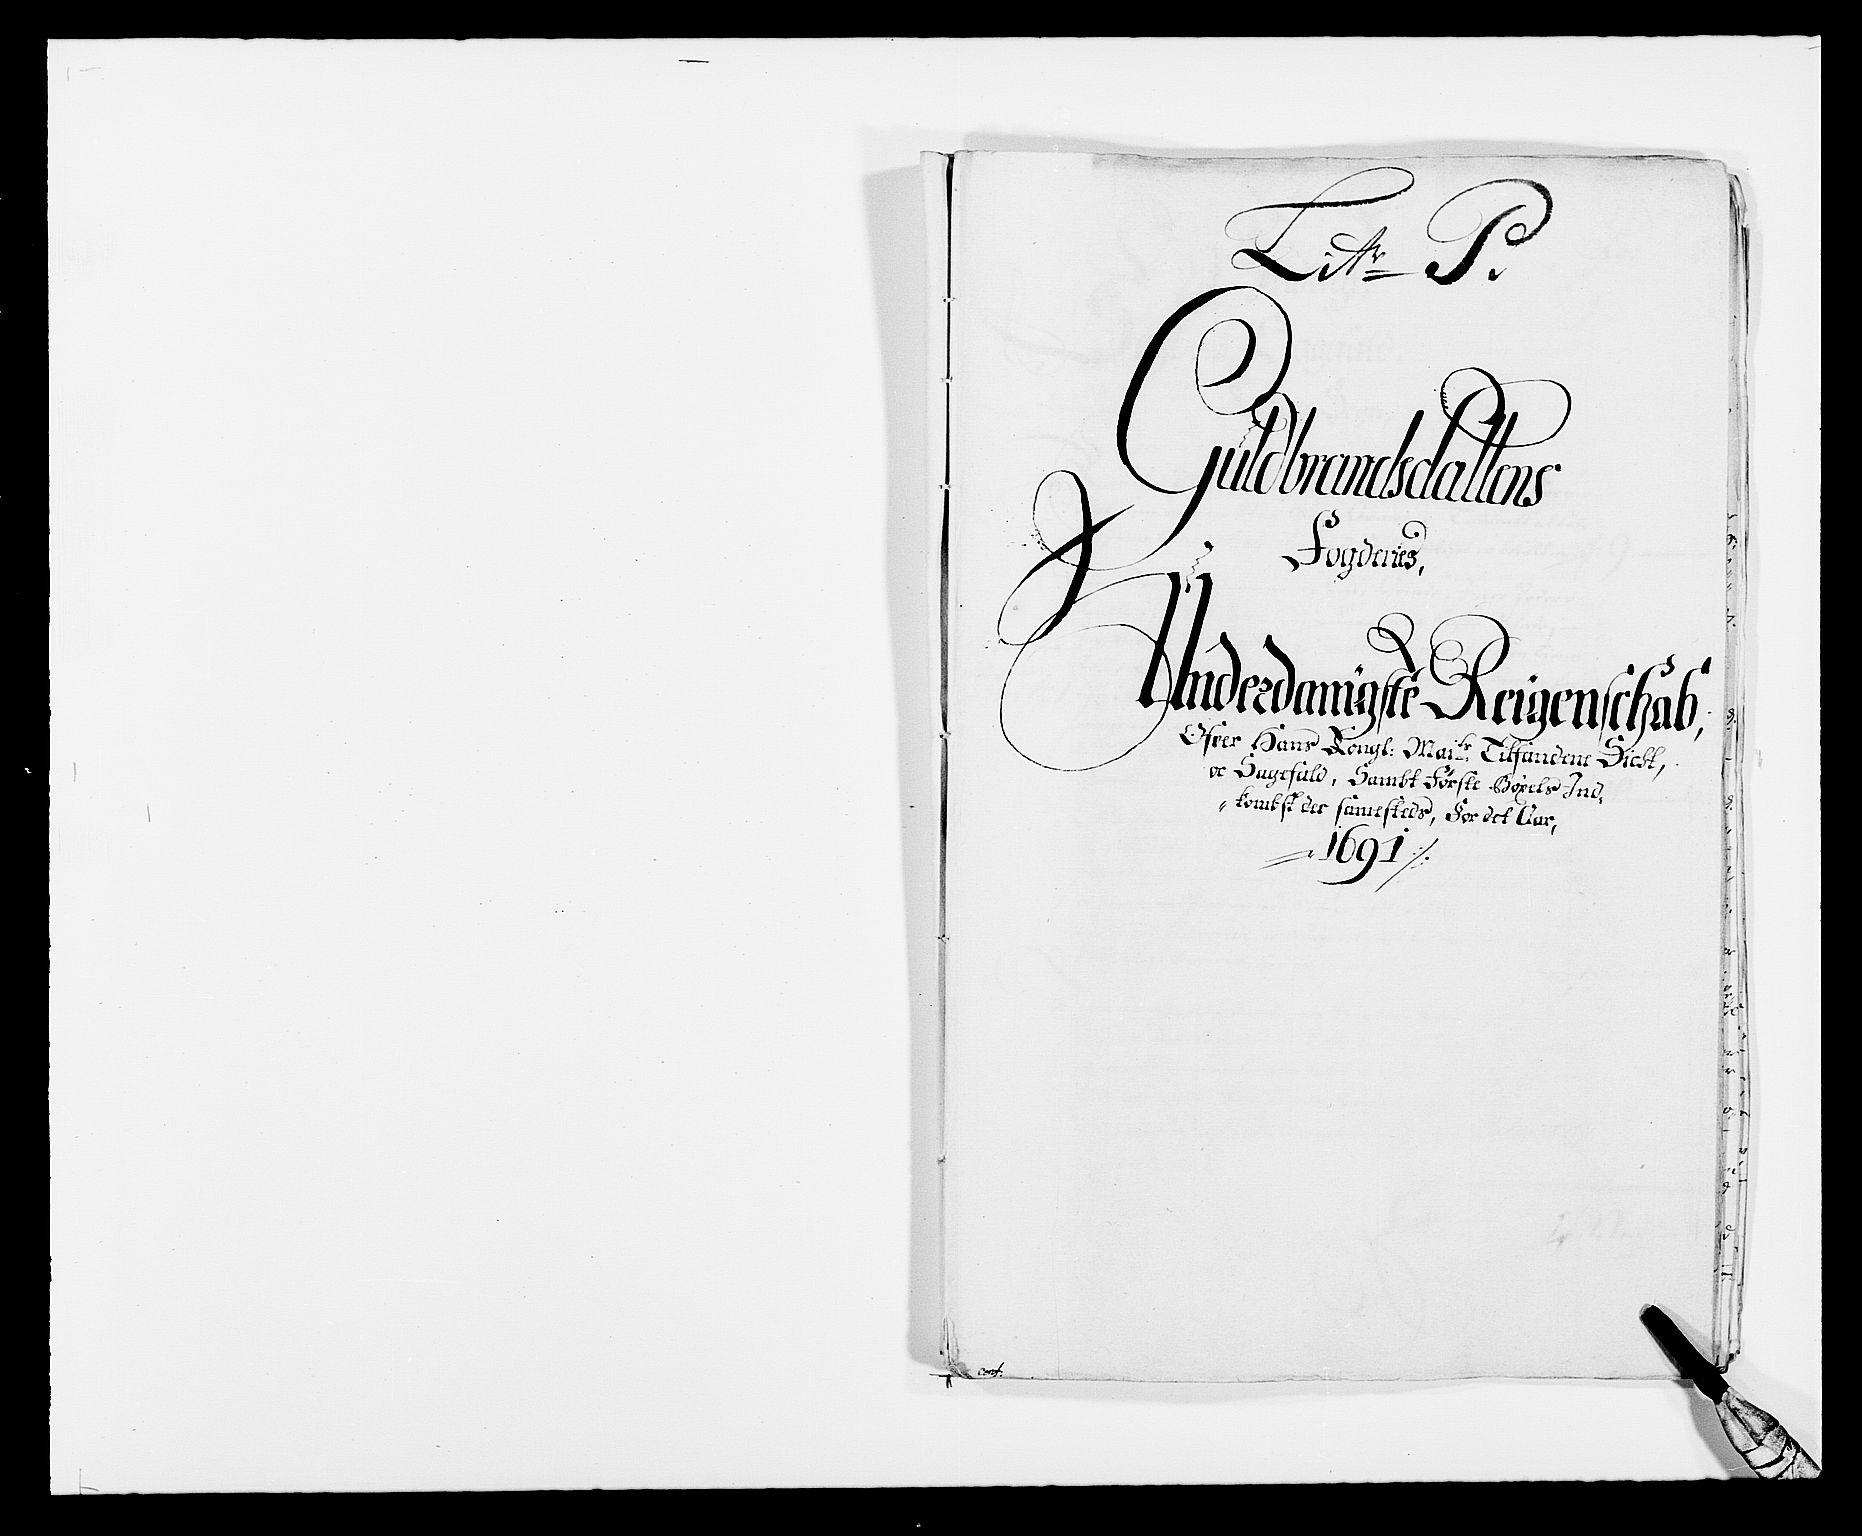 RA, Rentekammeret inntil 1814, Reviderte regnskaper, Fogderegnskap, R17/L1165: Fogderegnskap Gudbrandsdal, 1690-1692, s. 254